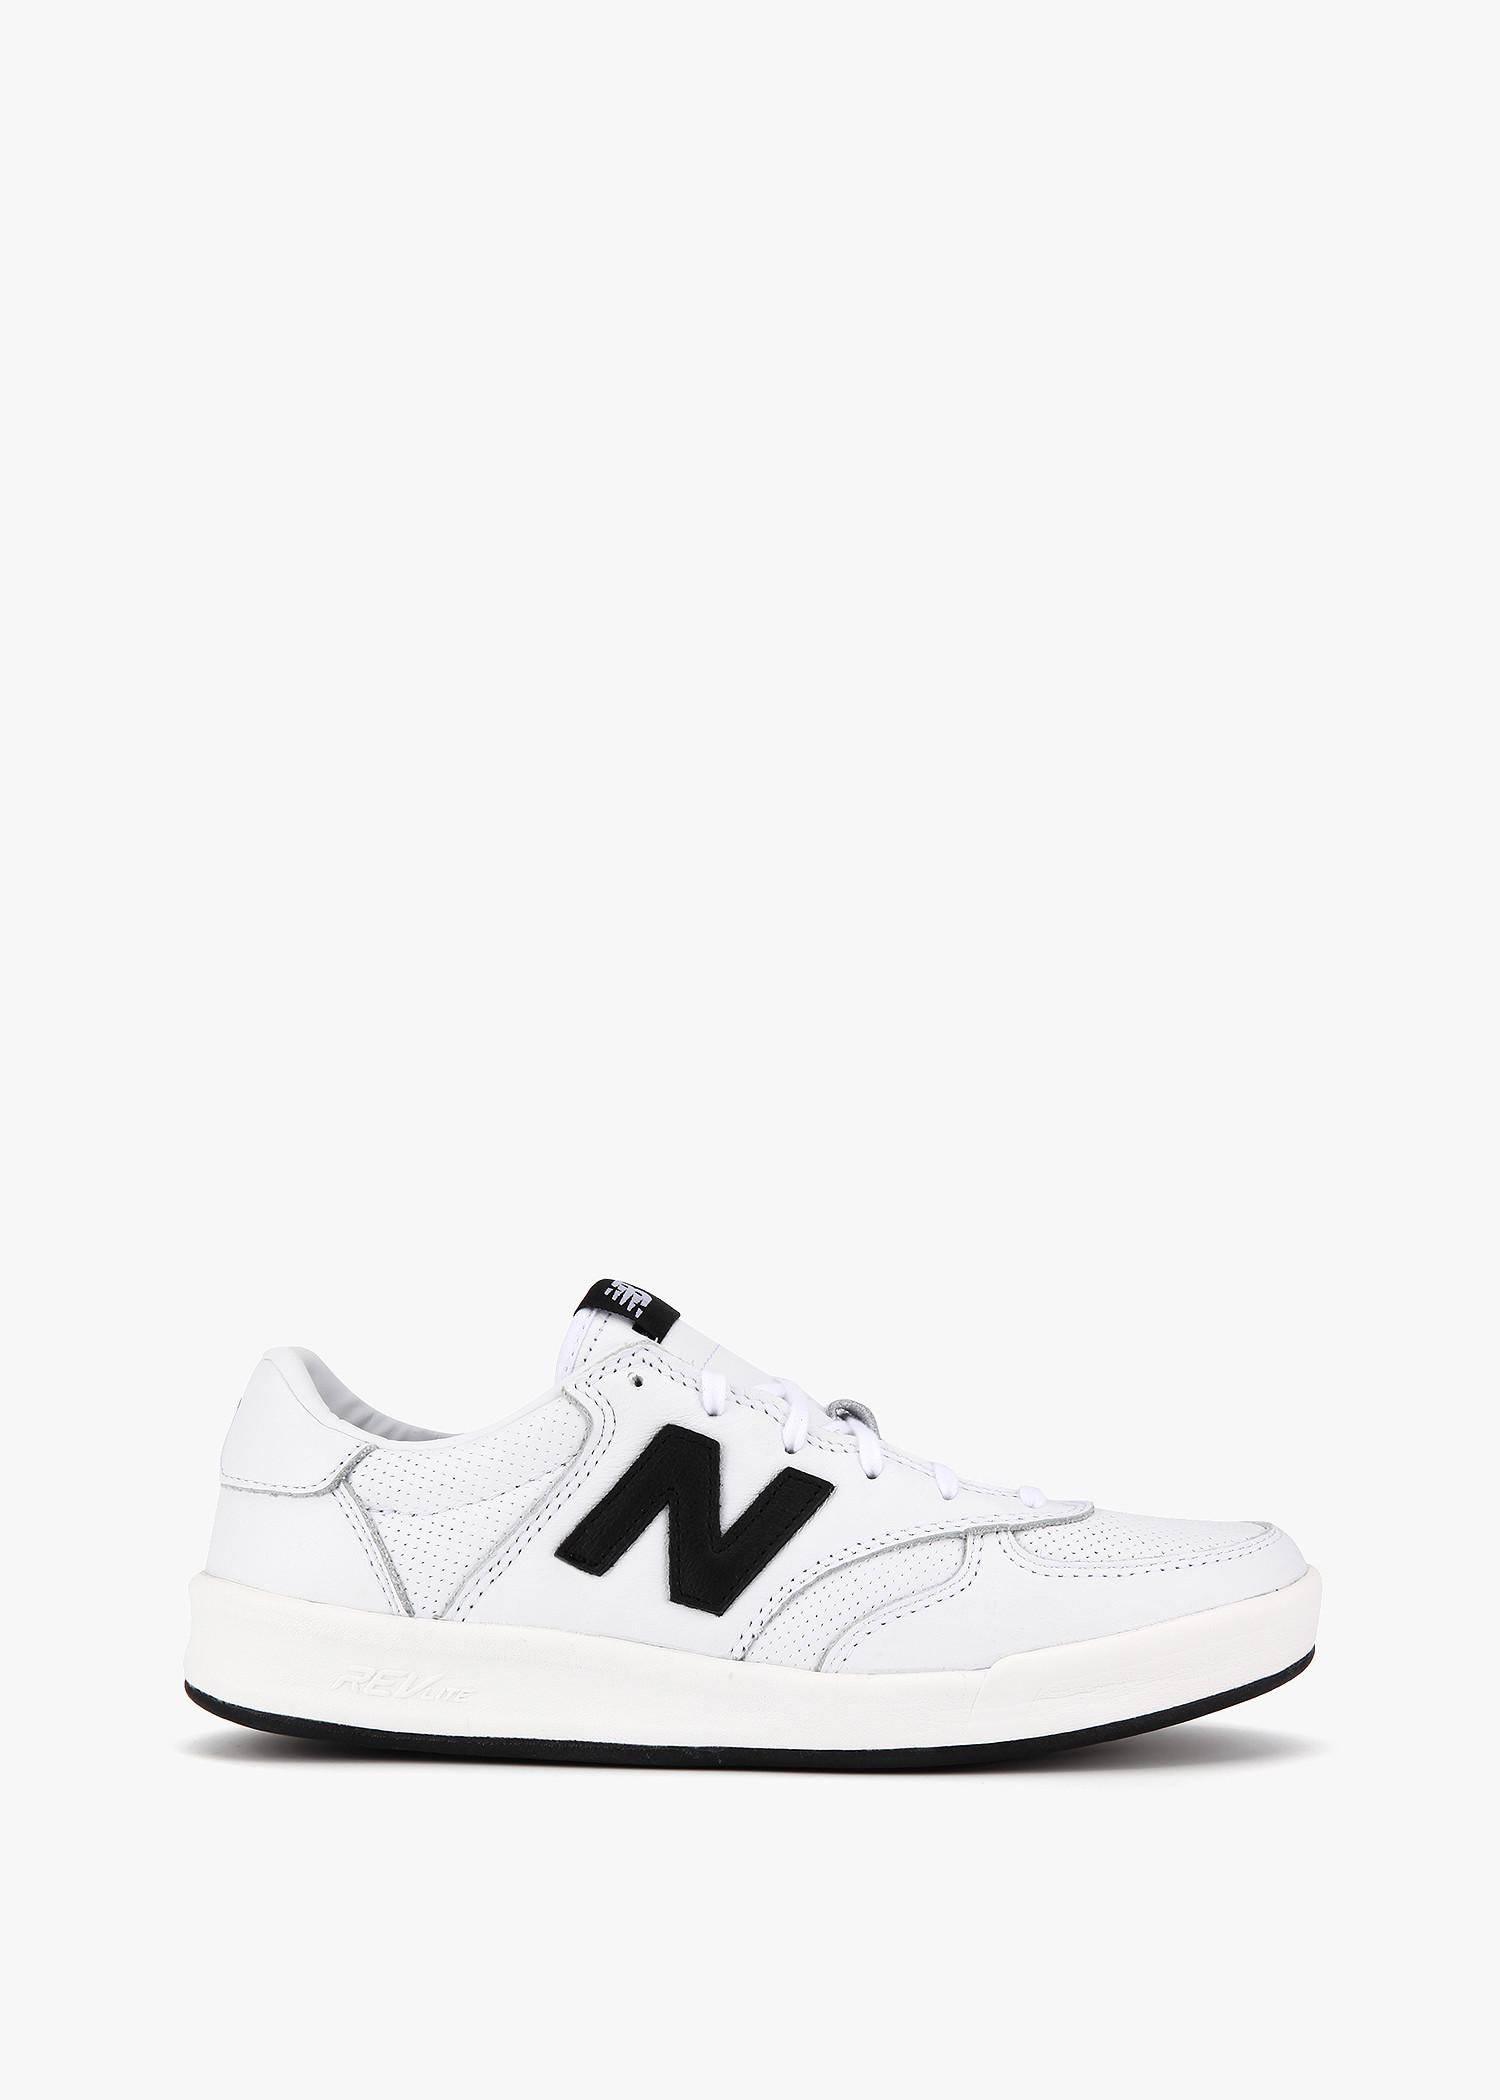 New Balance Crt300Lc In White/Black